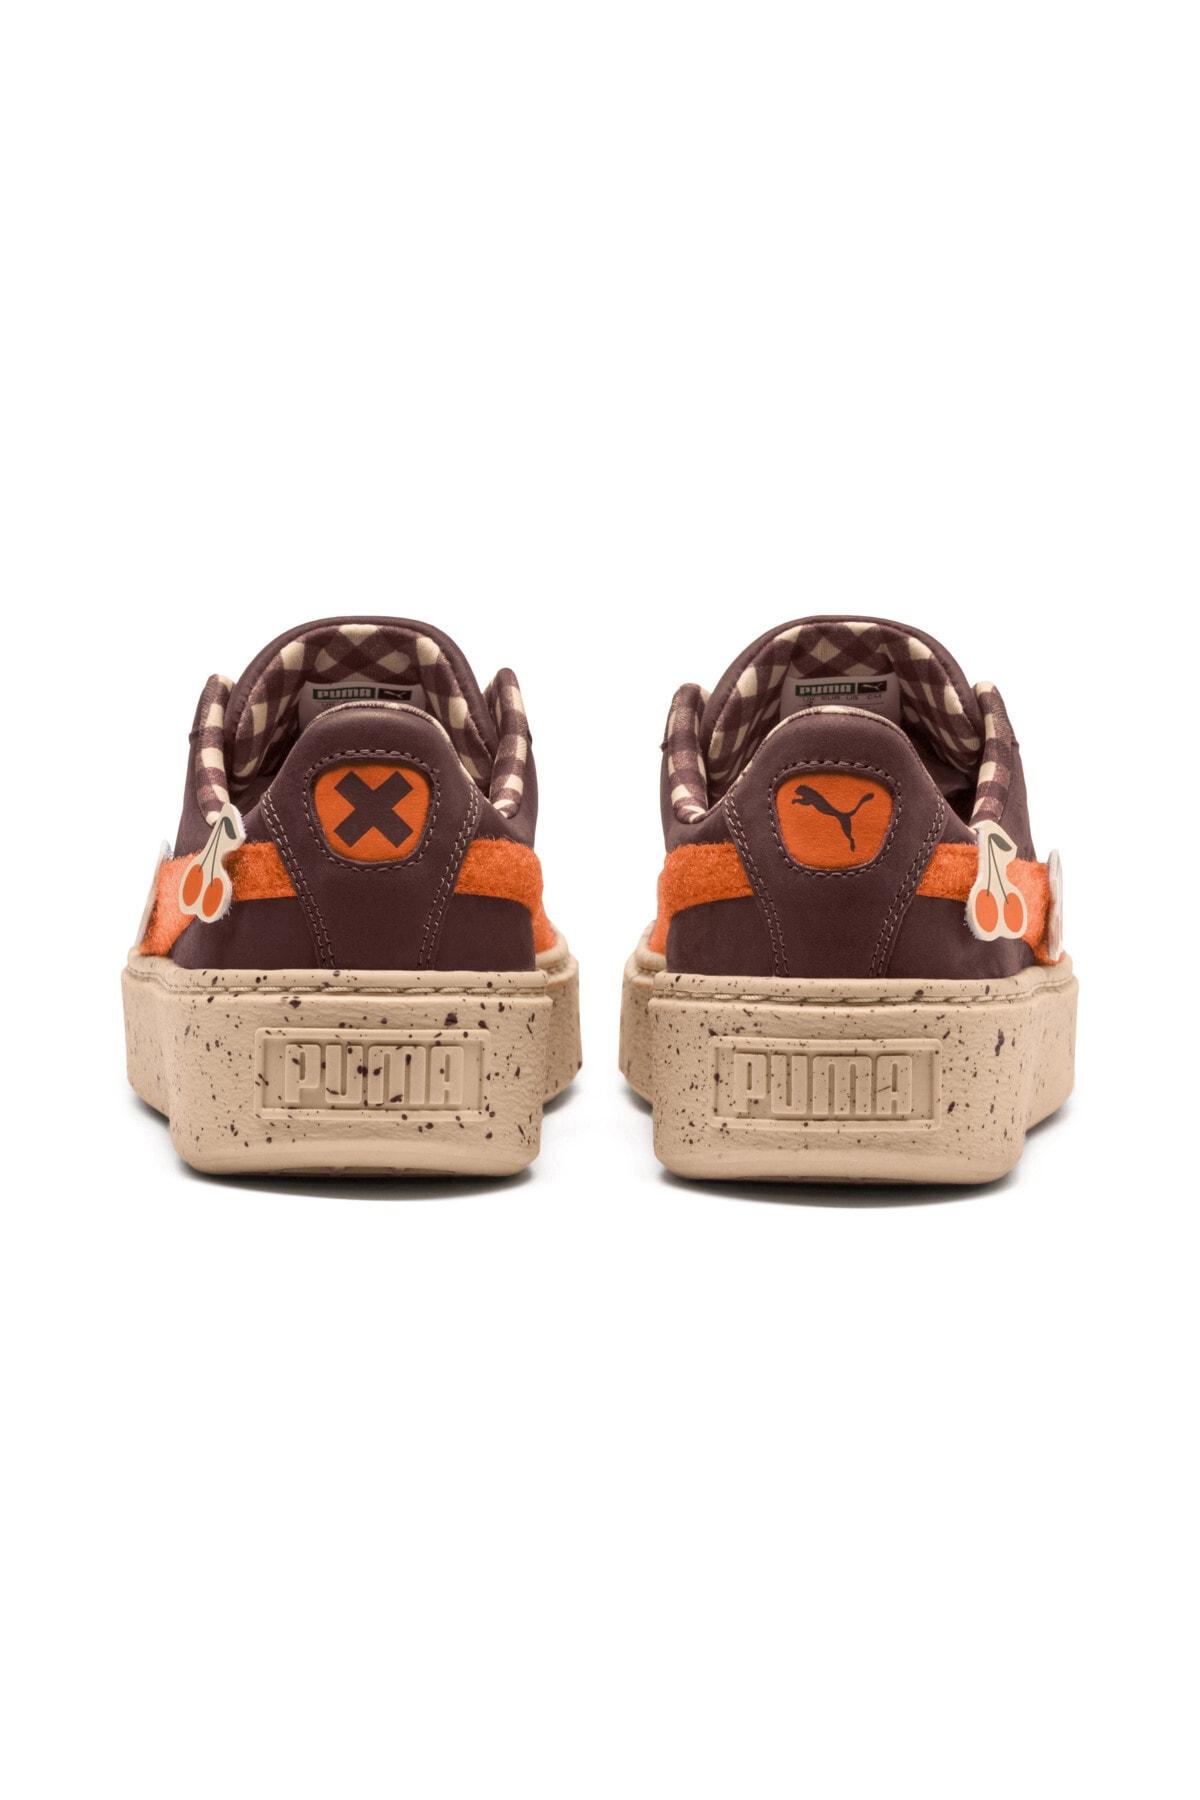 Puma PUMA x TINYCOTTONS Basket Platform Çocuk Ayakkabı 2